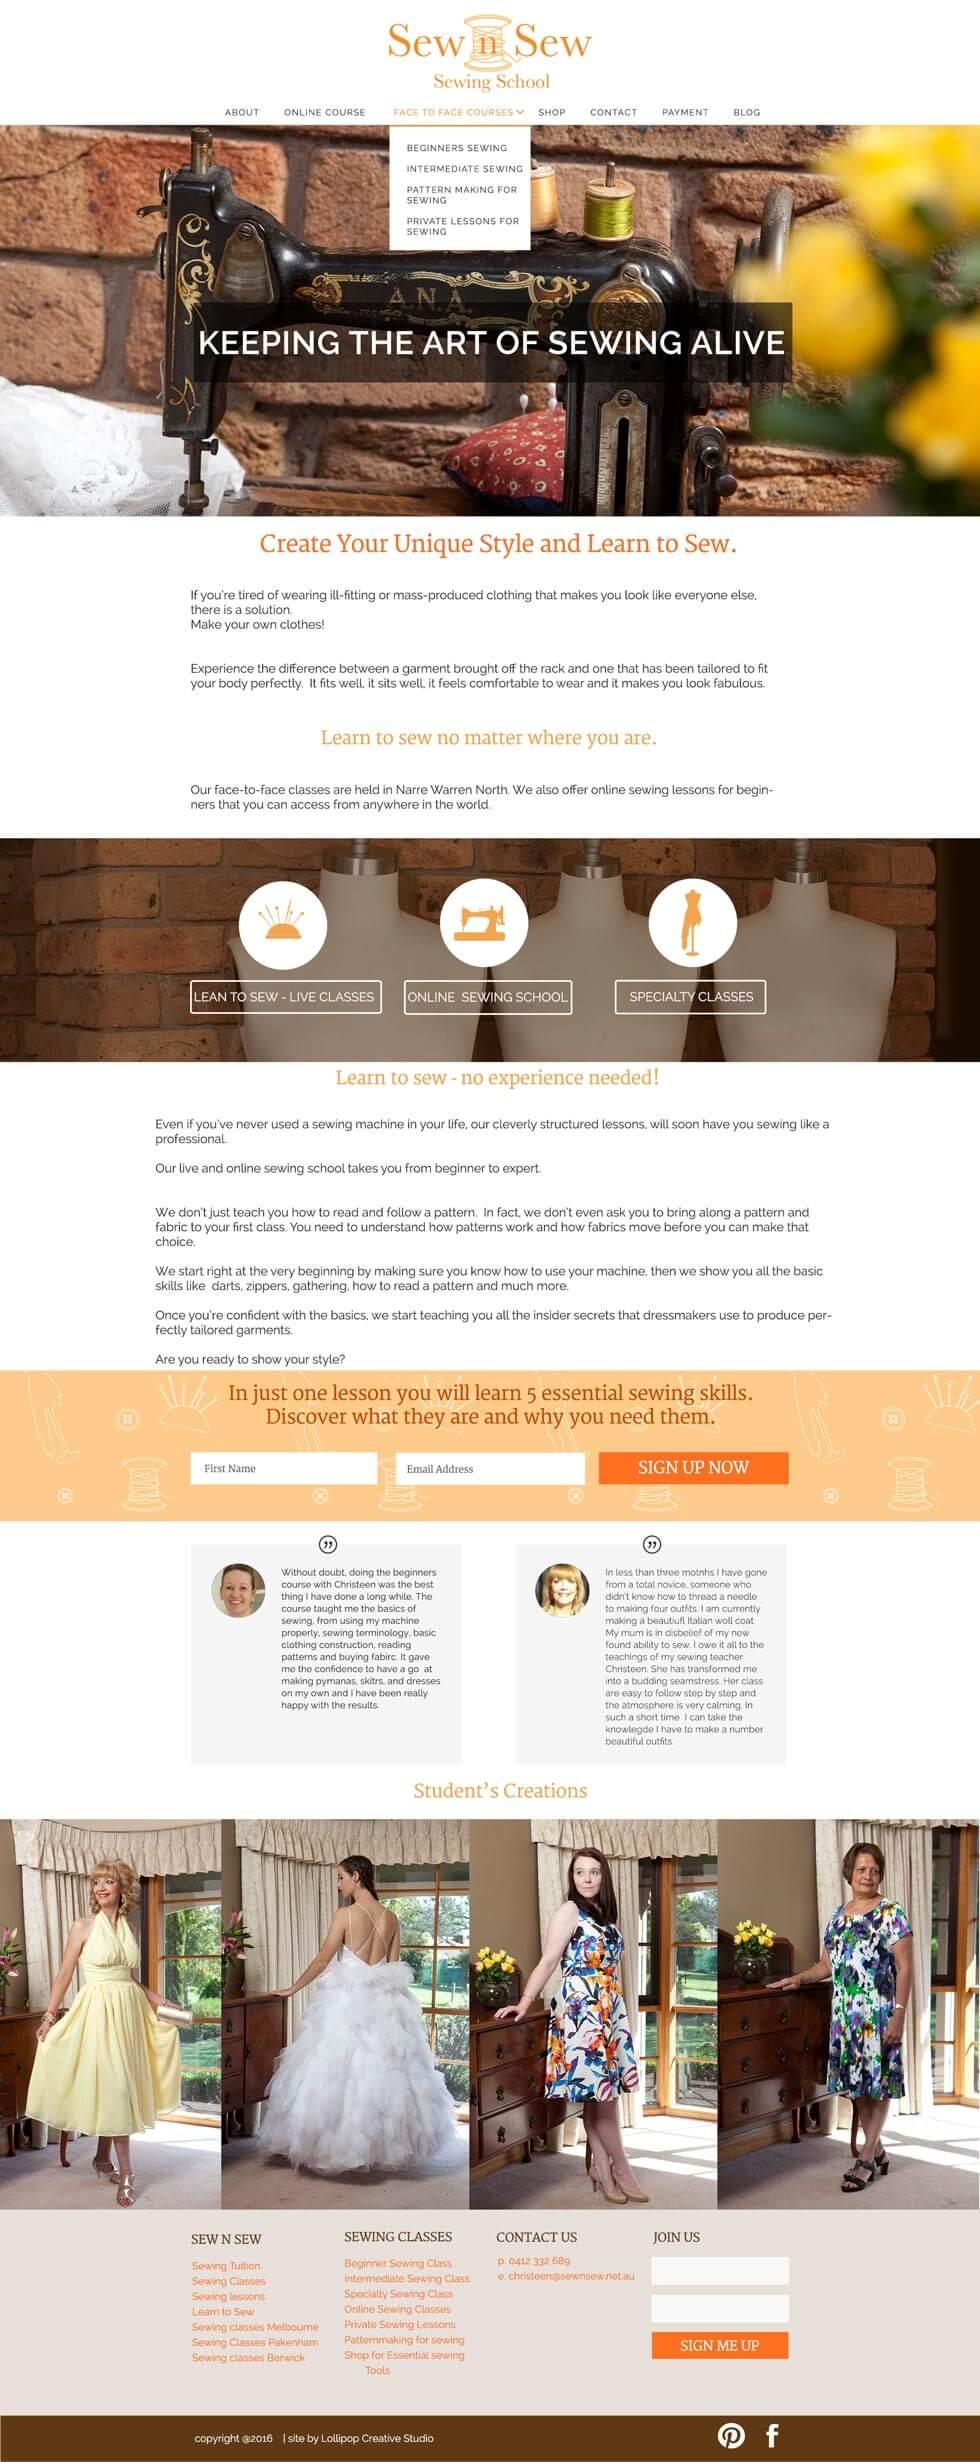 Sew n Sew Website Design